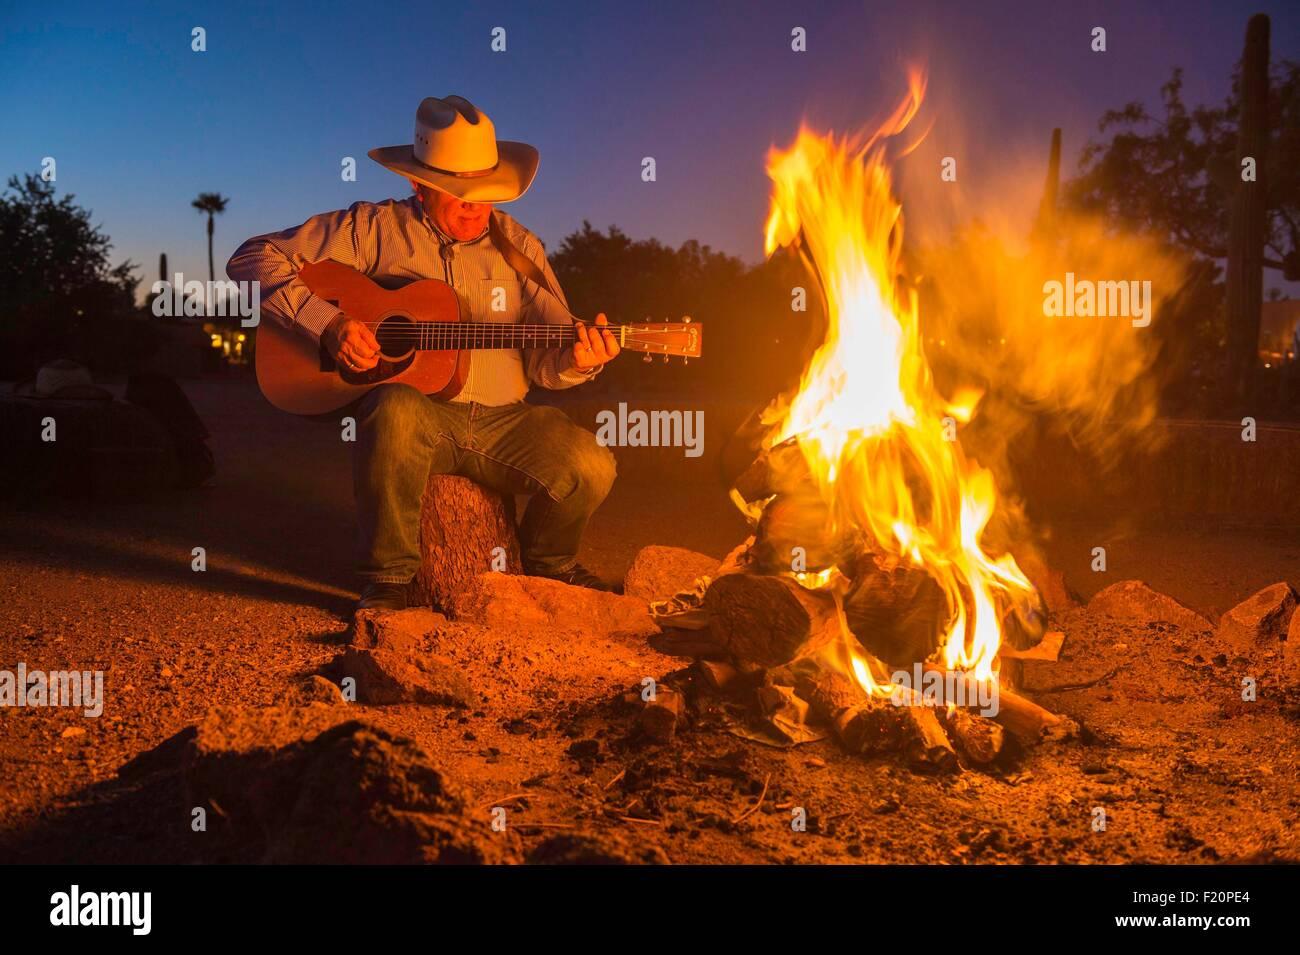 United States, Arizona, Tucson, White Stallion Ranch, Bill Ganz giving a concert - Stock Image